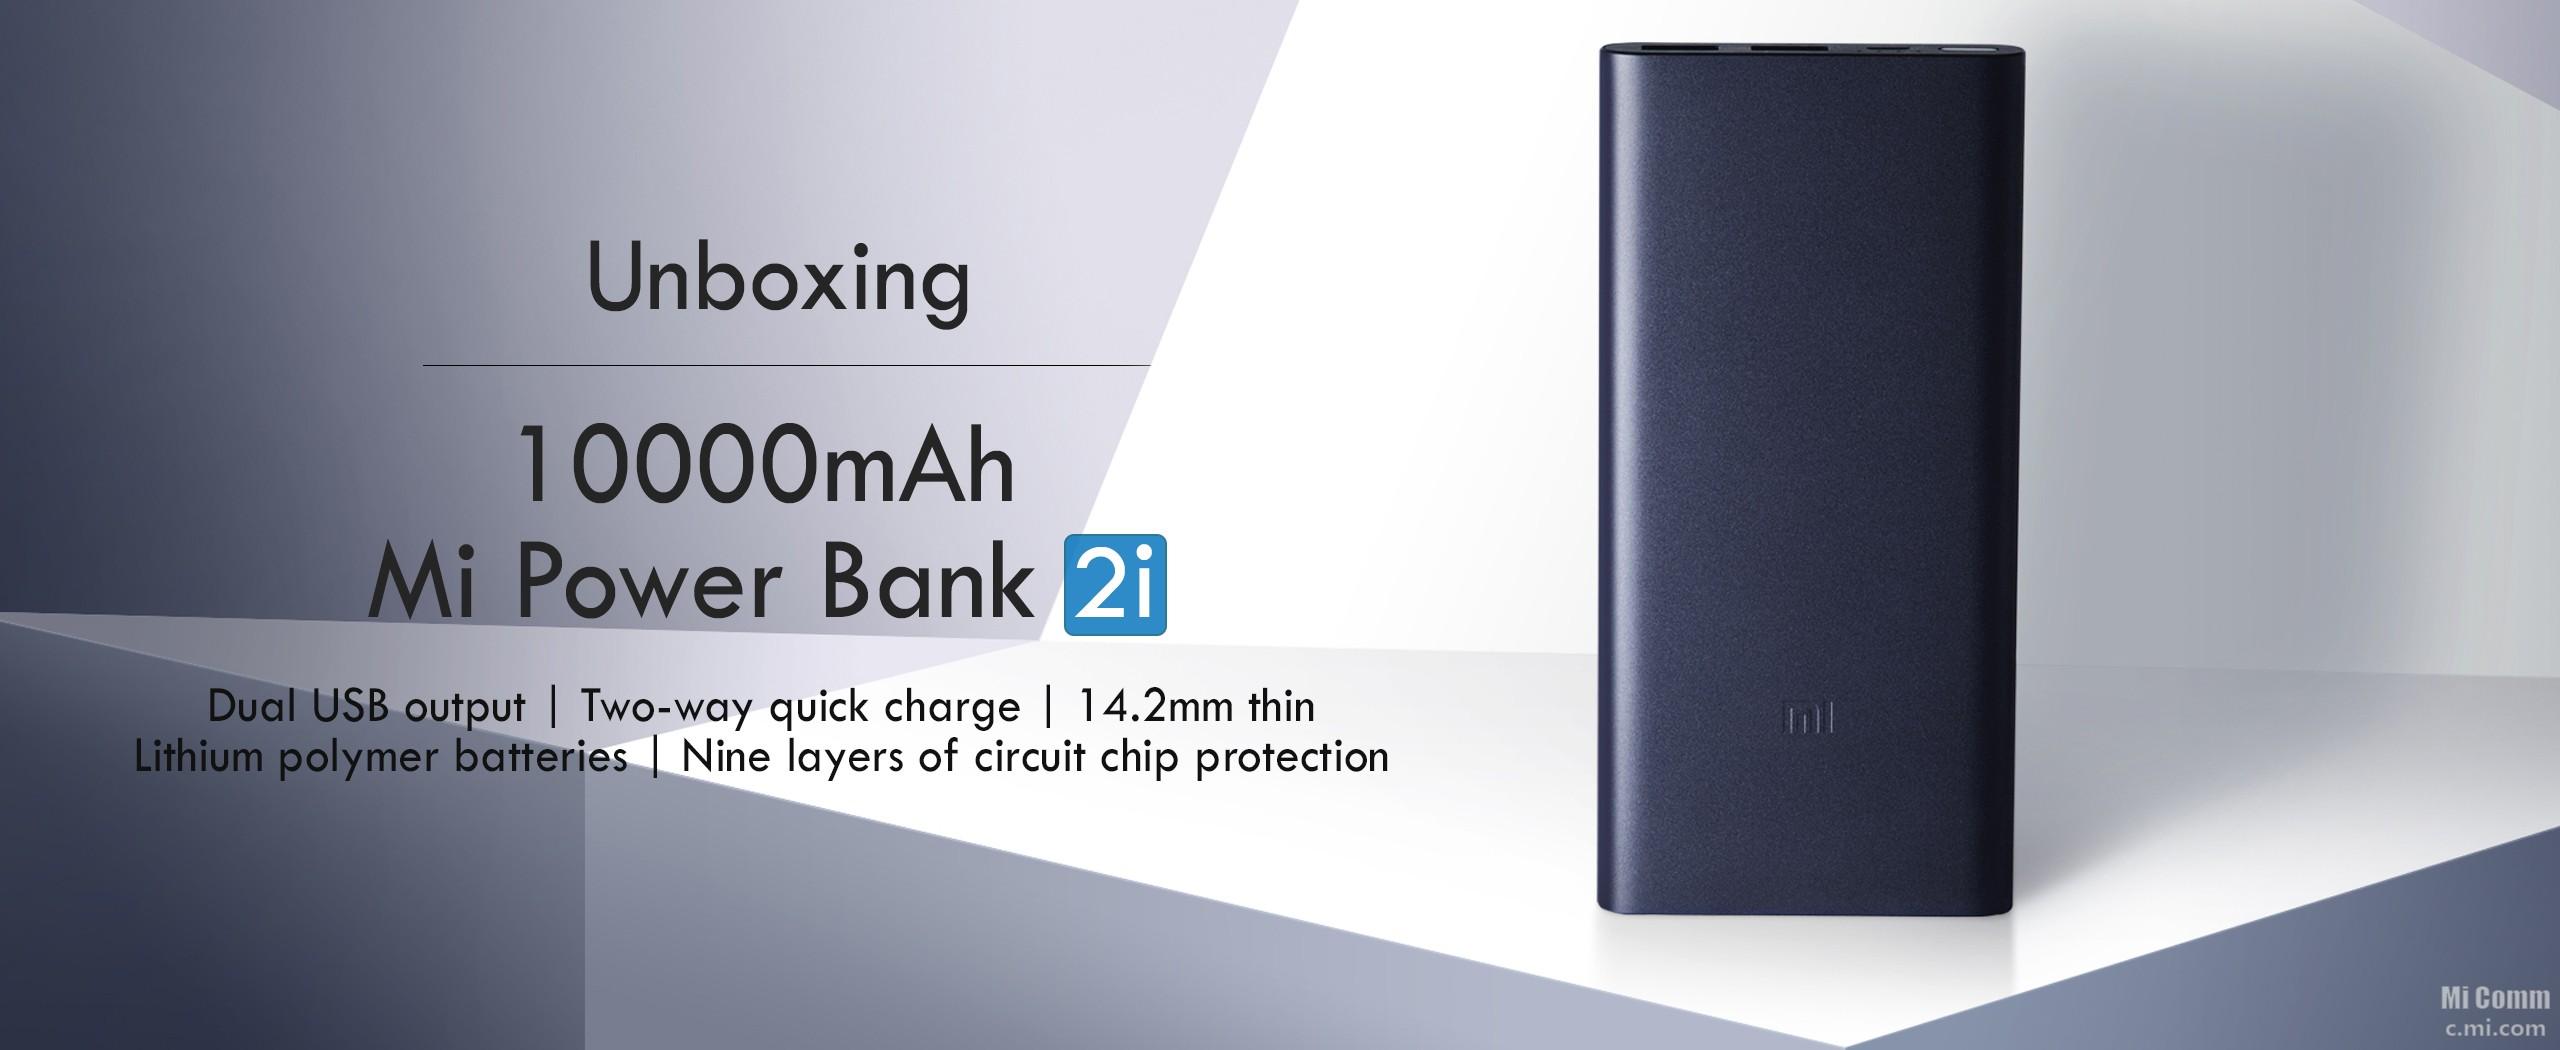 Unboxing 10000mah Mi Power Bank 2i Accessories Community Xiaomi Powerbank Slim 10000ma